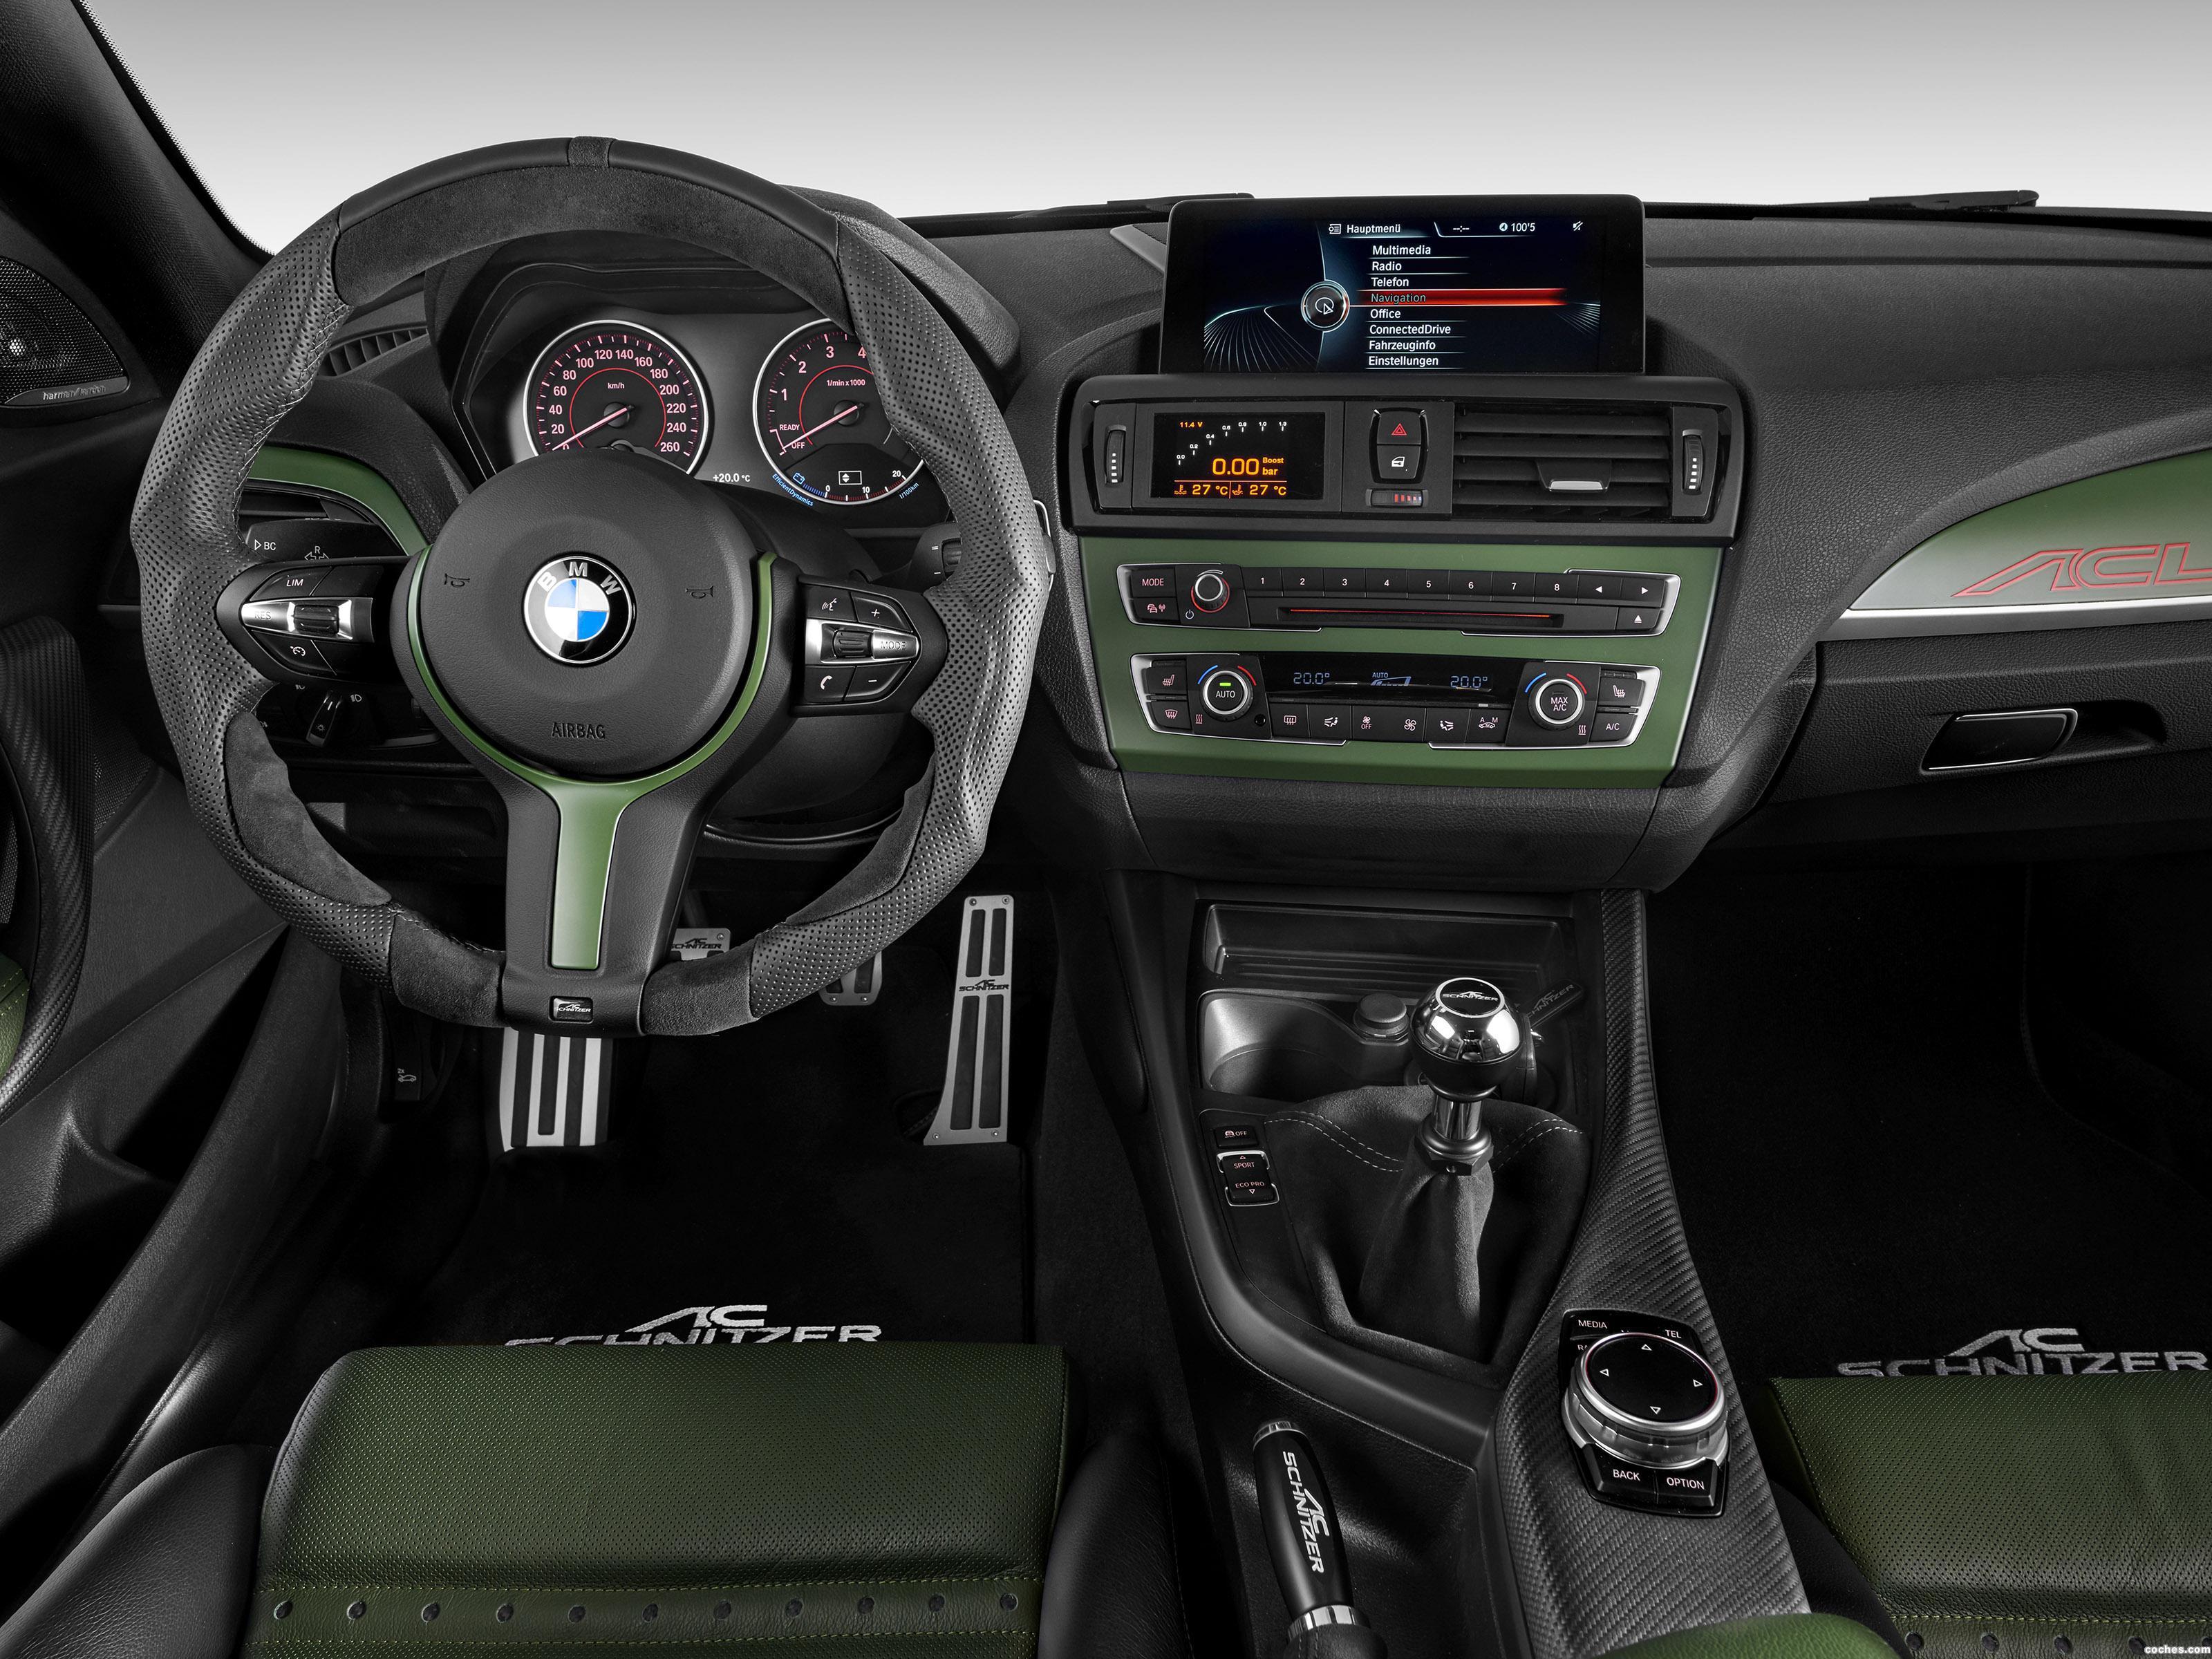 Foto 19 de AC-Schnitzer BMW Serie 2 ACL2 F22 2016